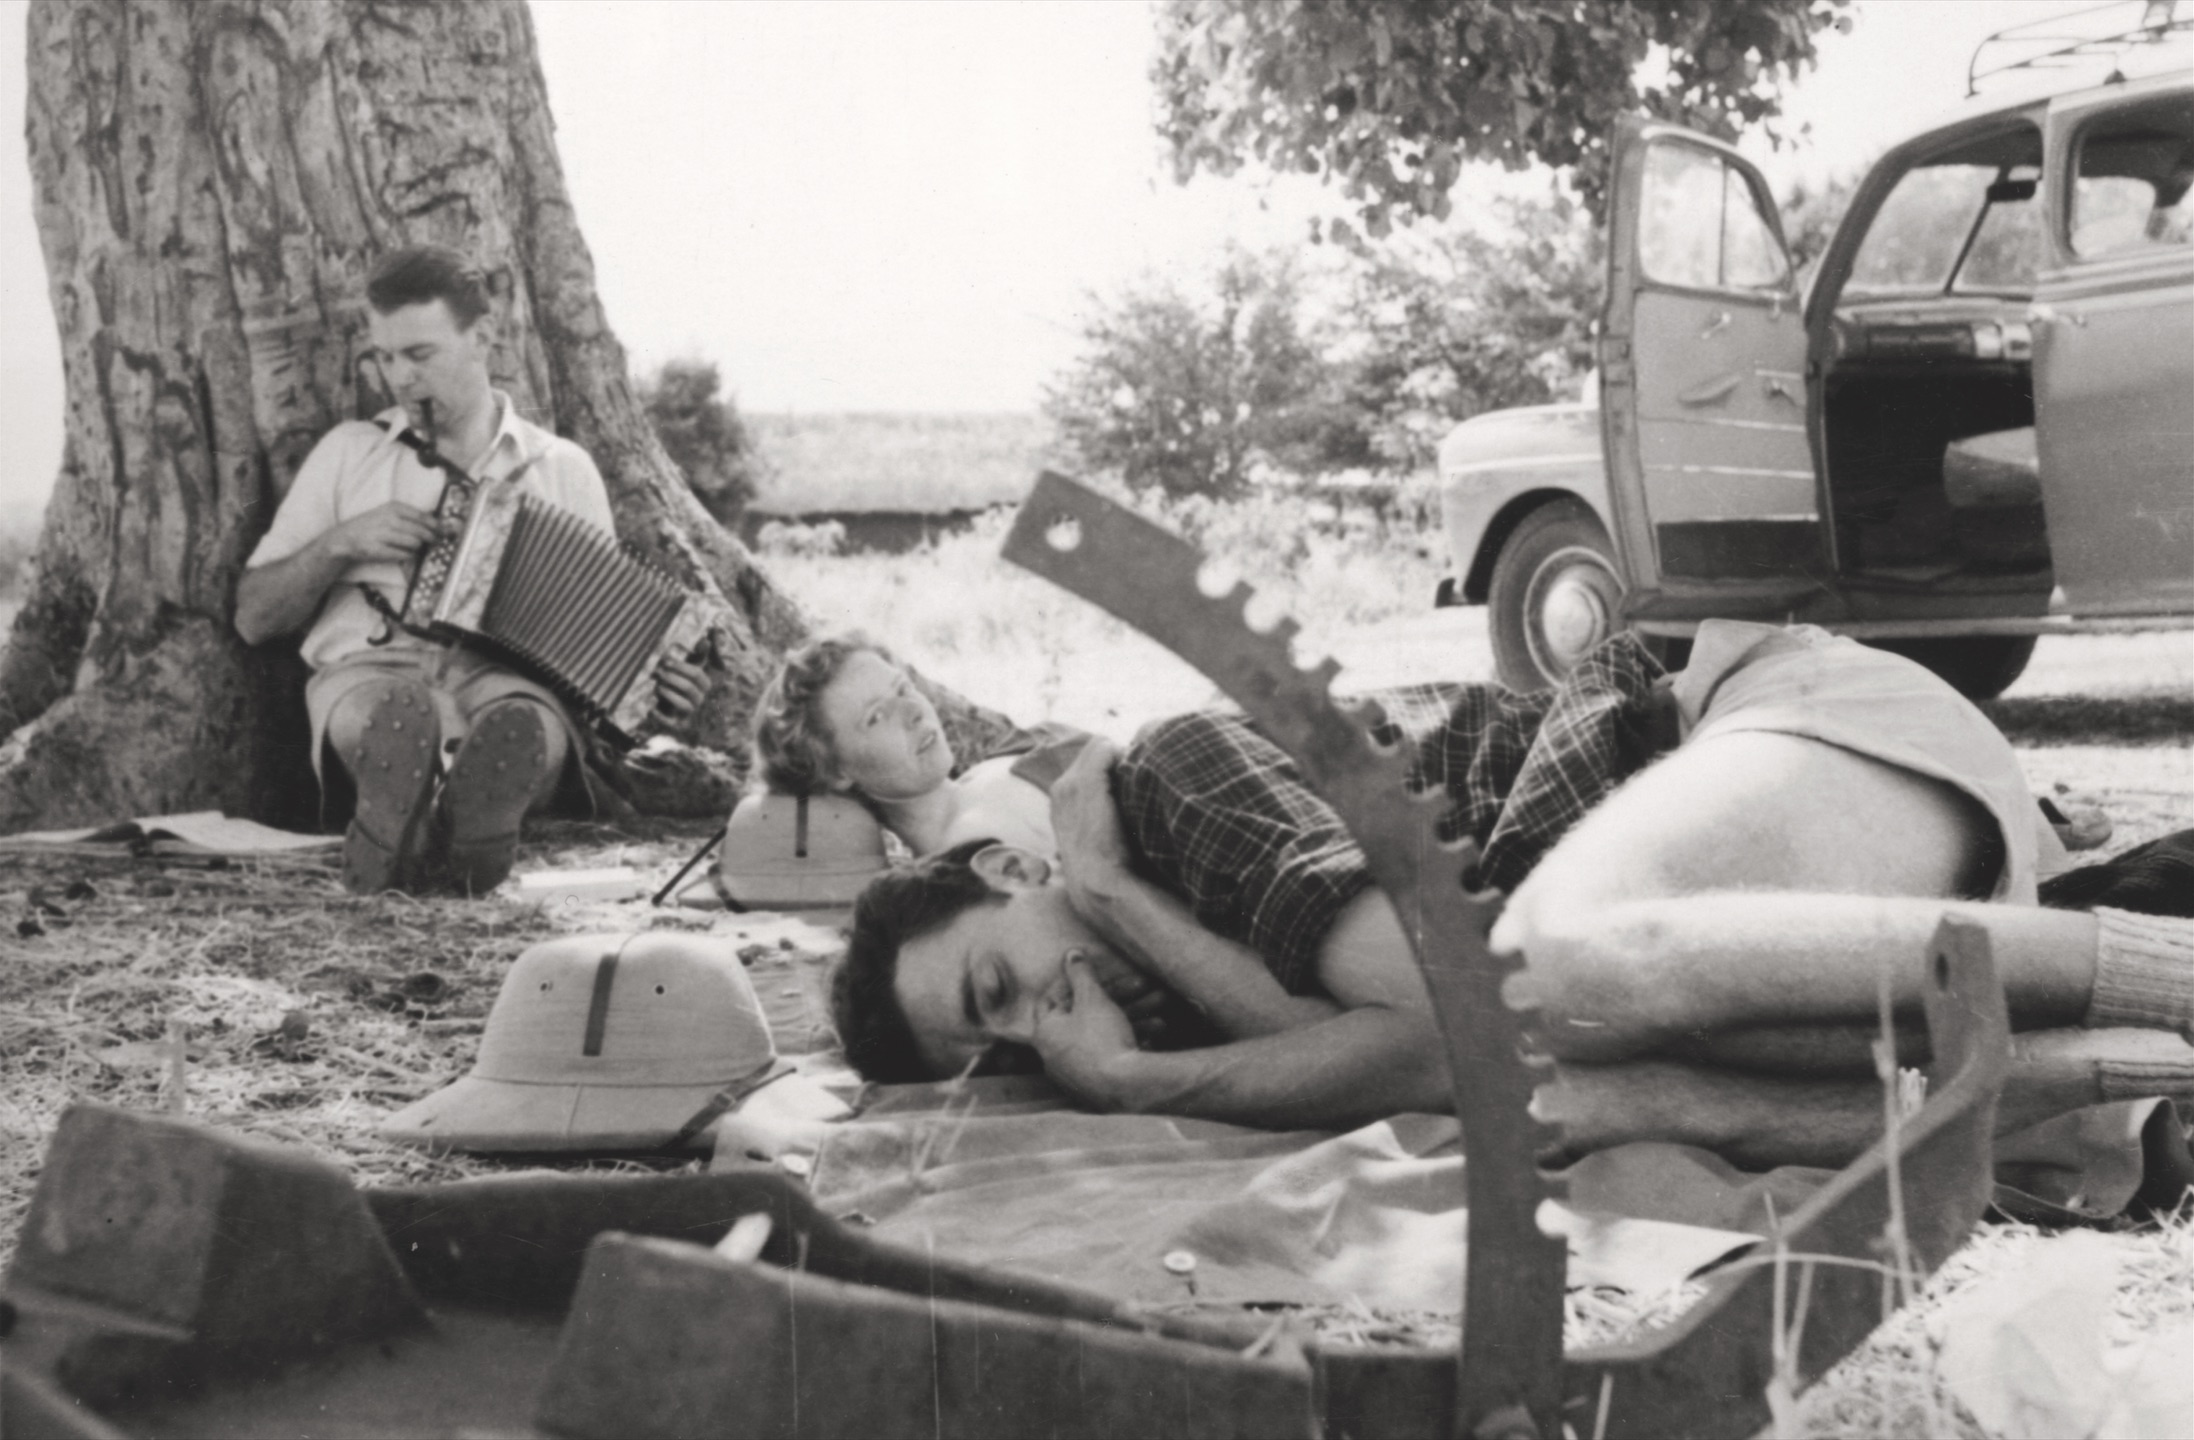 Sekretärin Bossart-Gloor, Tierfänger Rüfenacht, Buchhalter Hartmann mit Handorgel. Arusha, Tanzania, ca. 1955, Privatbesitz